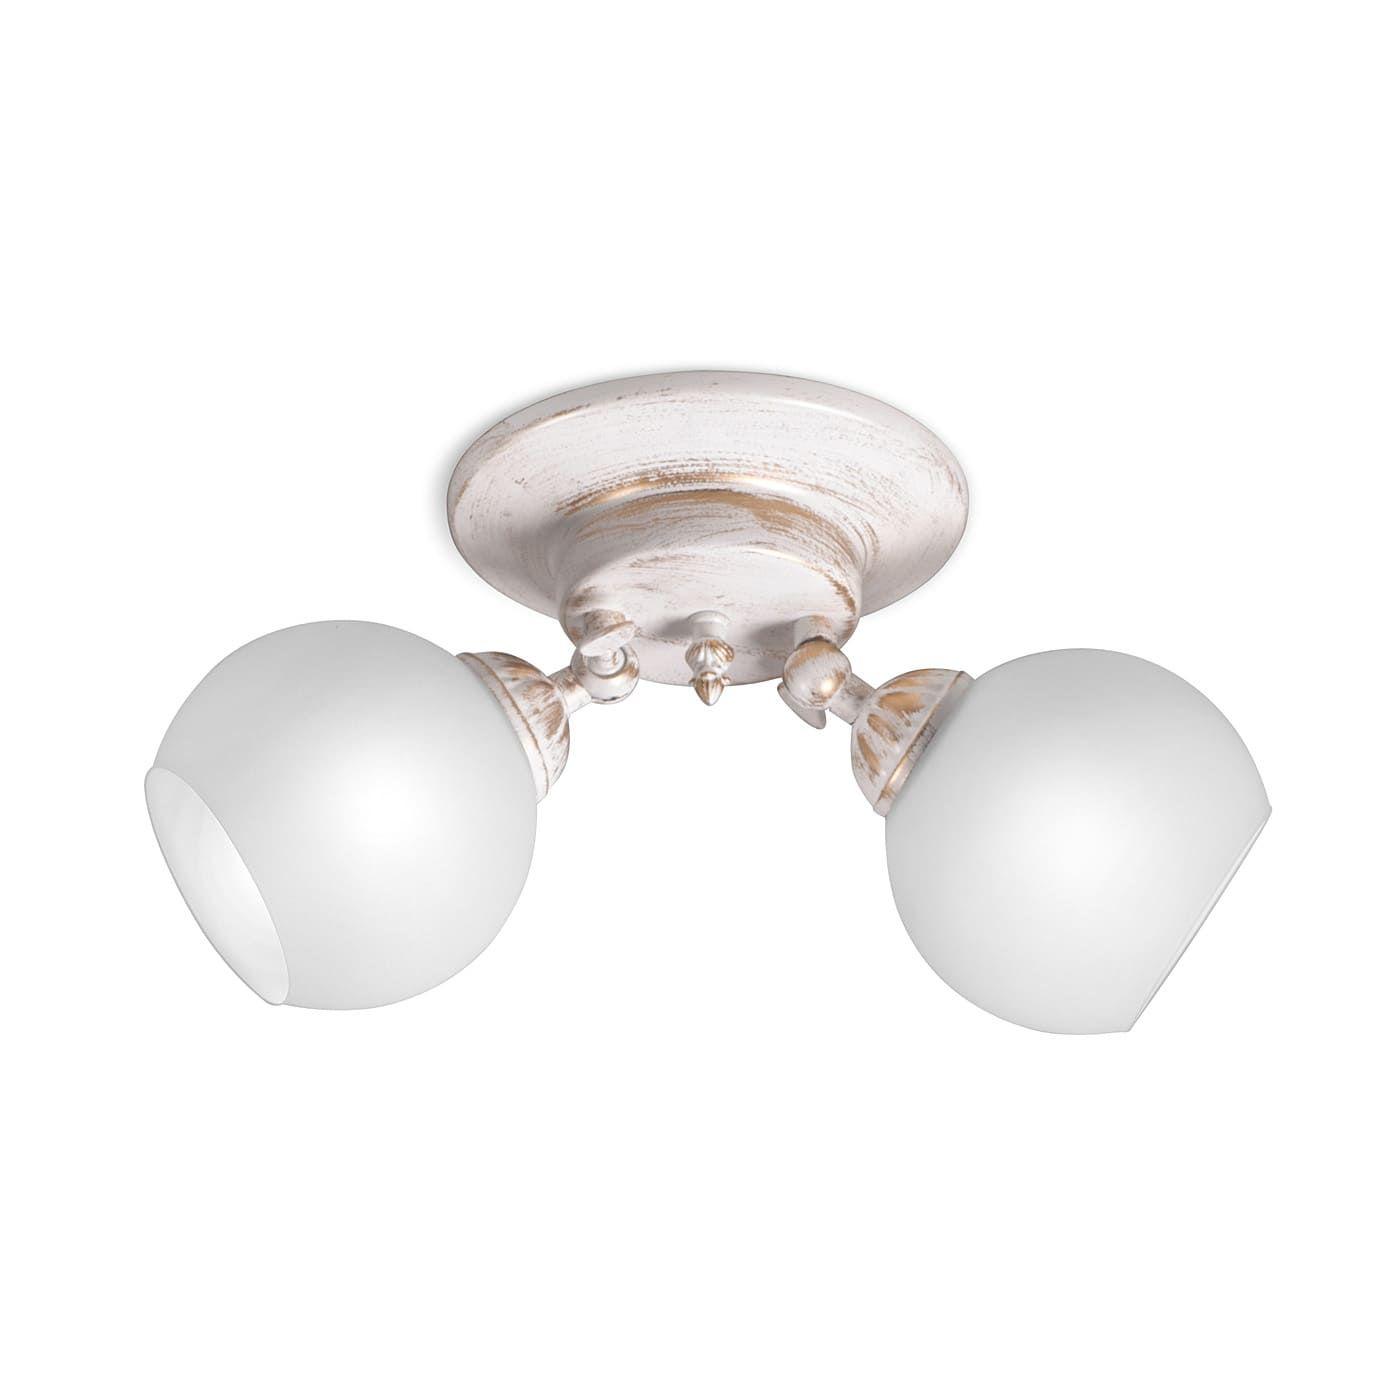 PETRASVET / Ceiling chandelier S2196-2, 2xE27 max. 60W